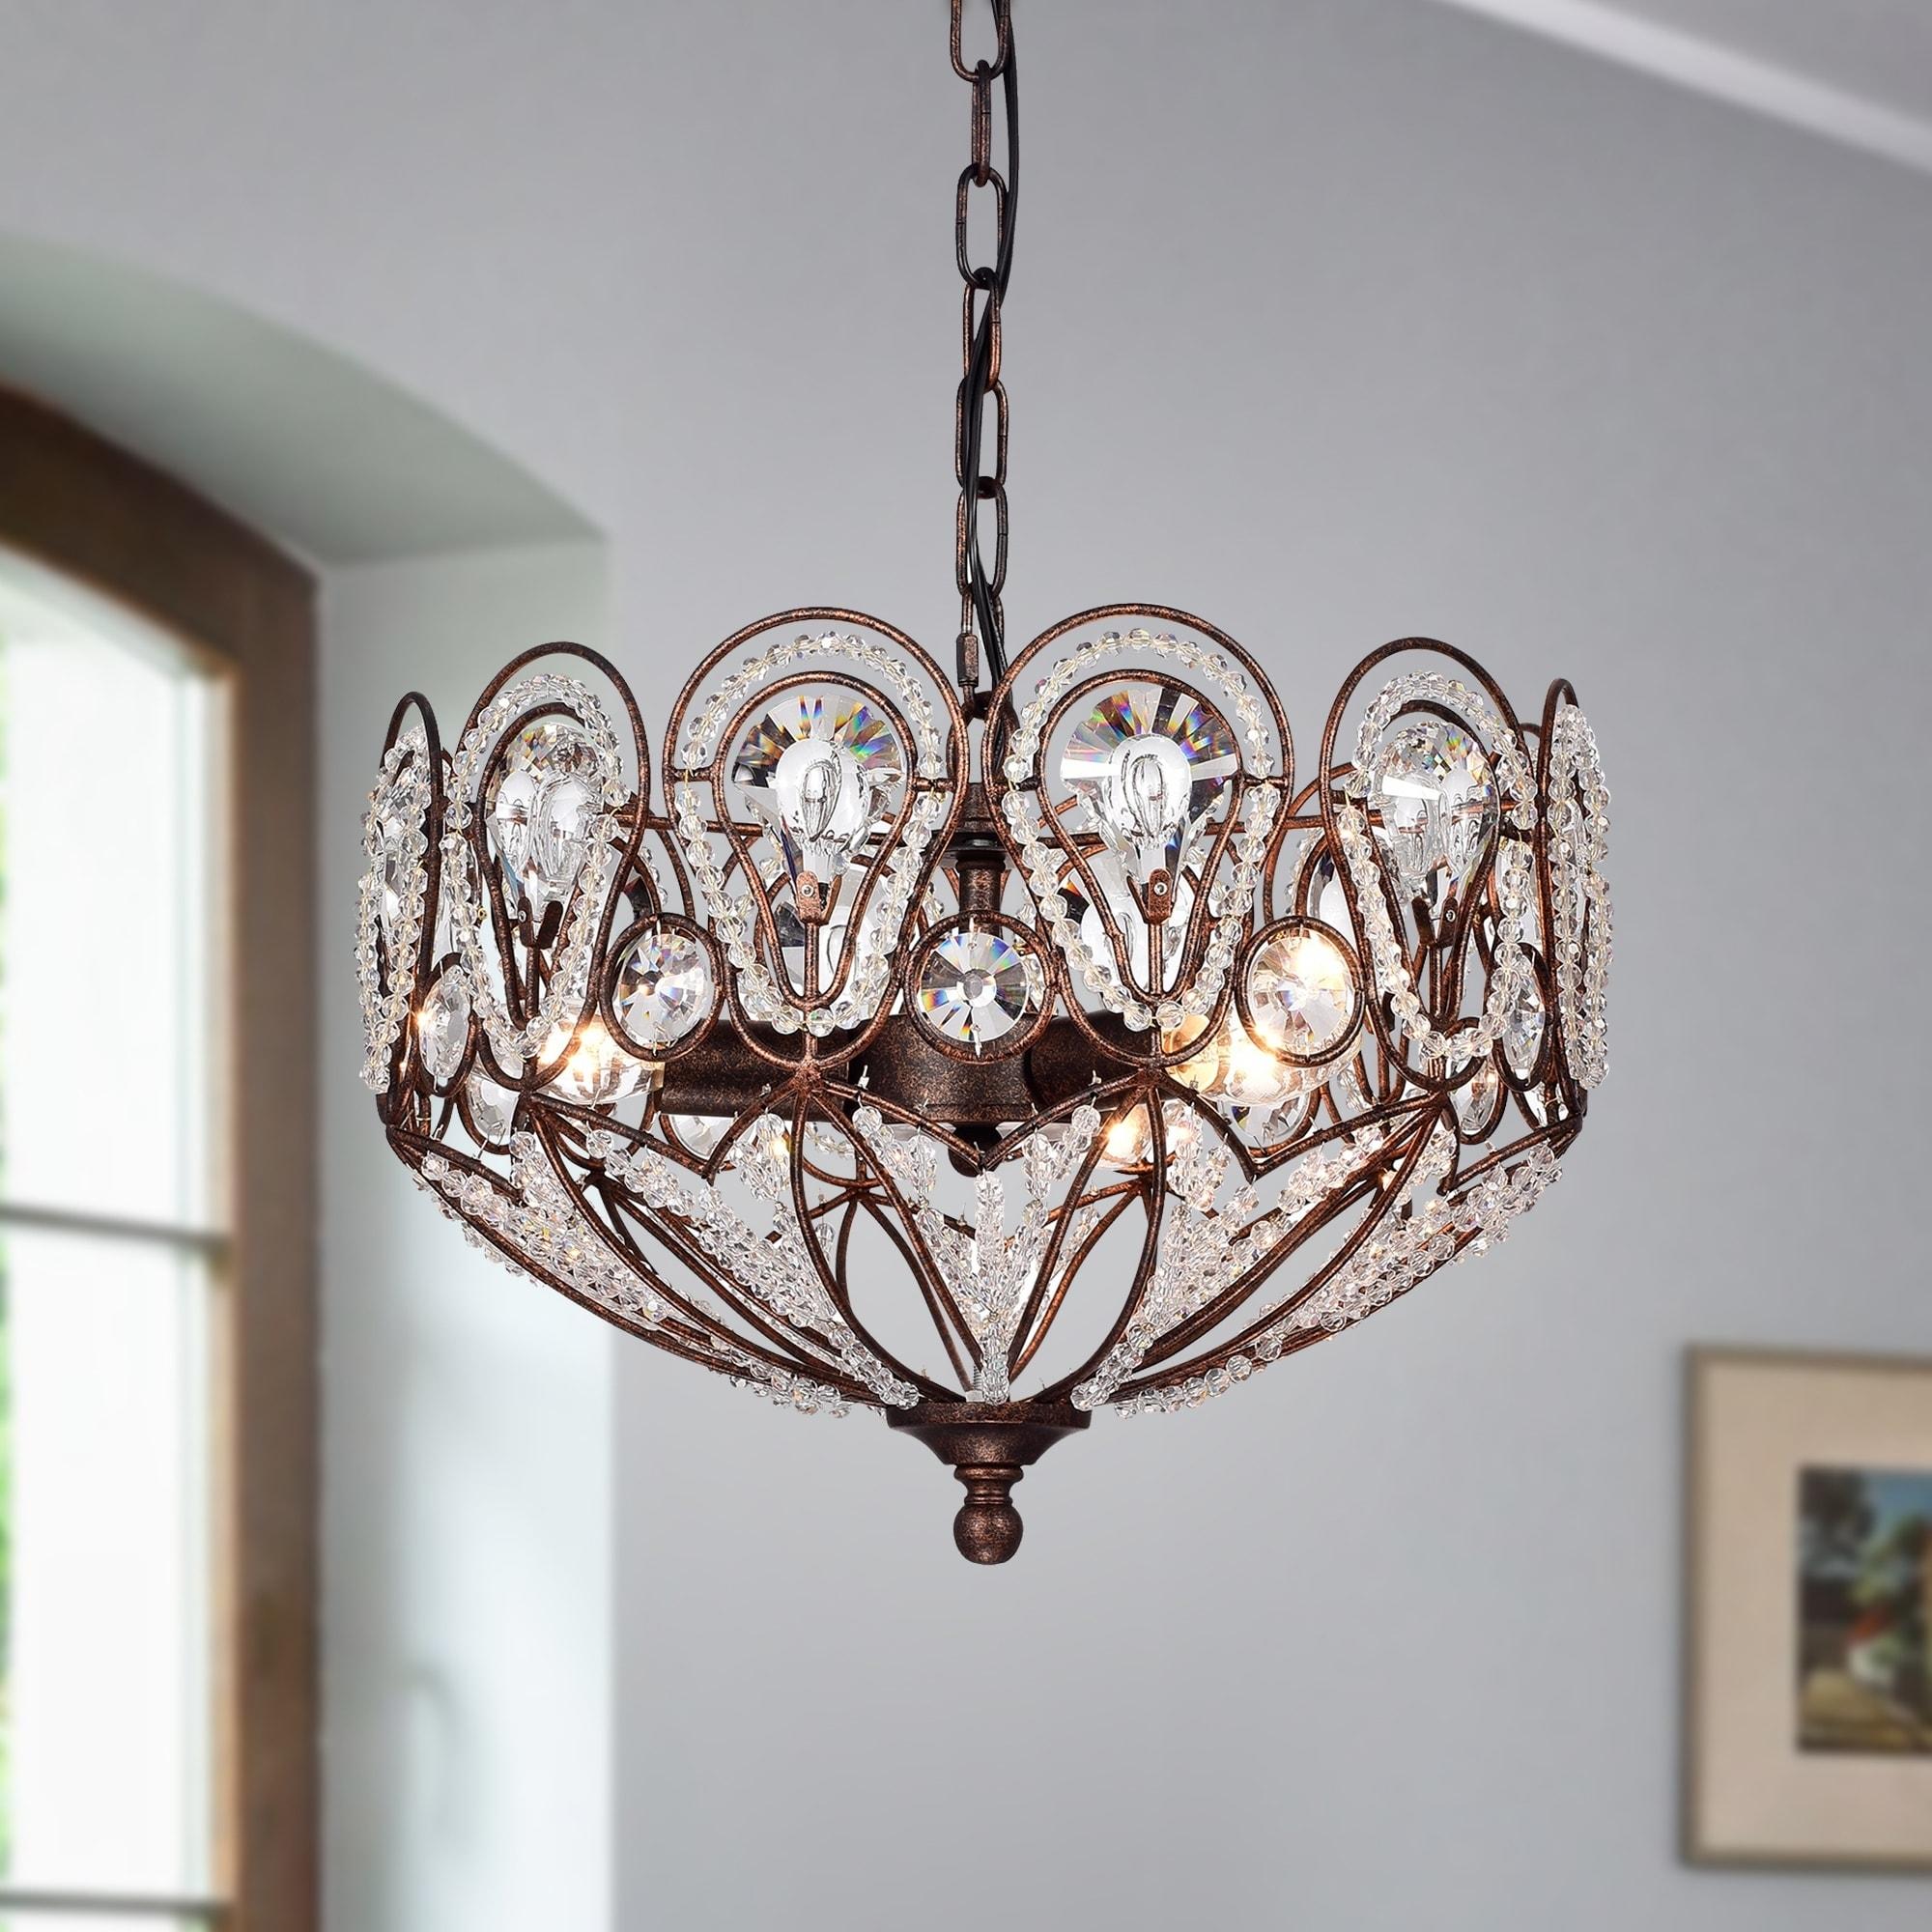 Latir rustic bronze 3 light crystal pendant lamp